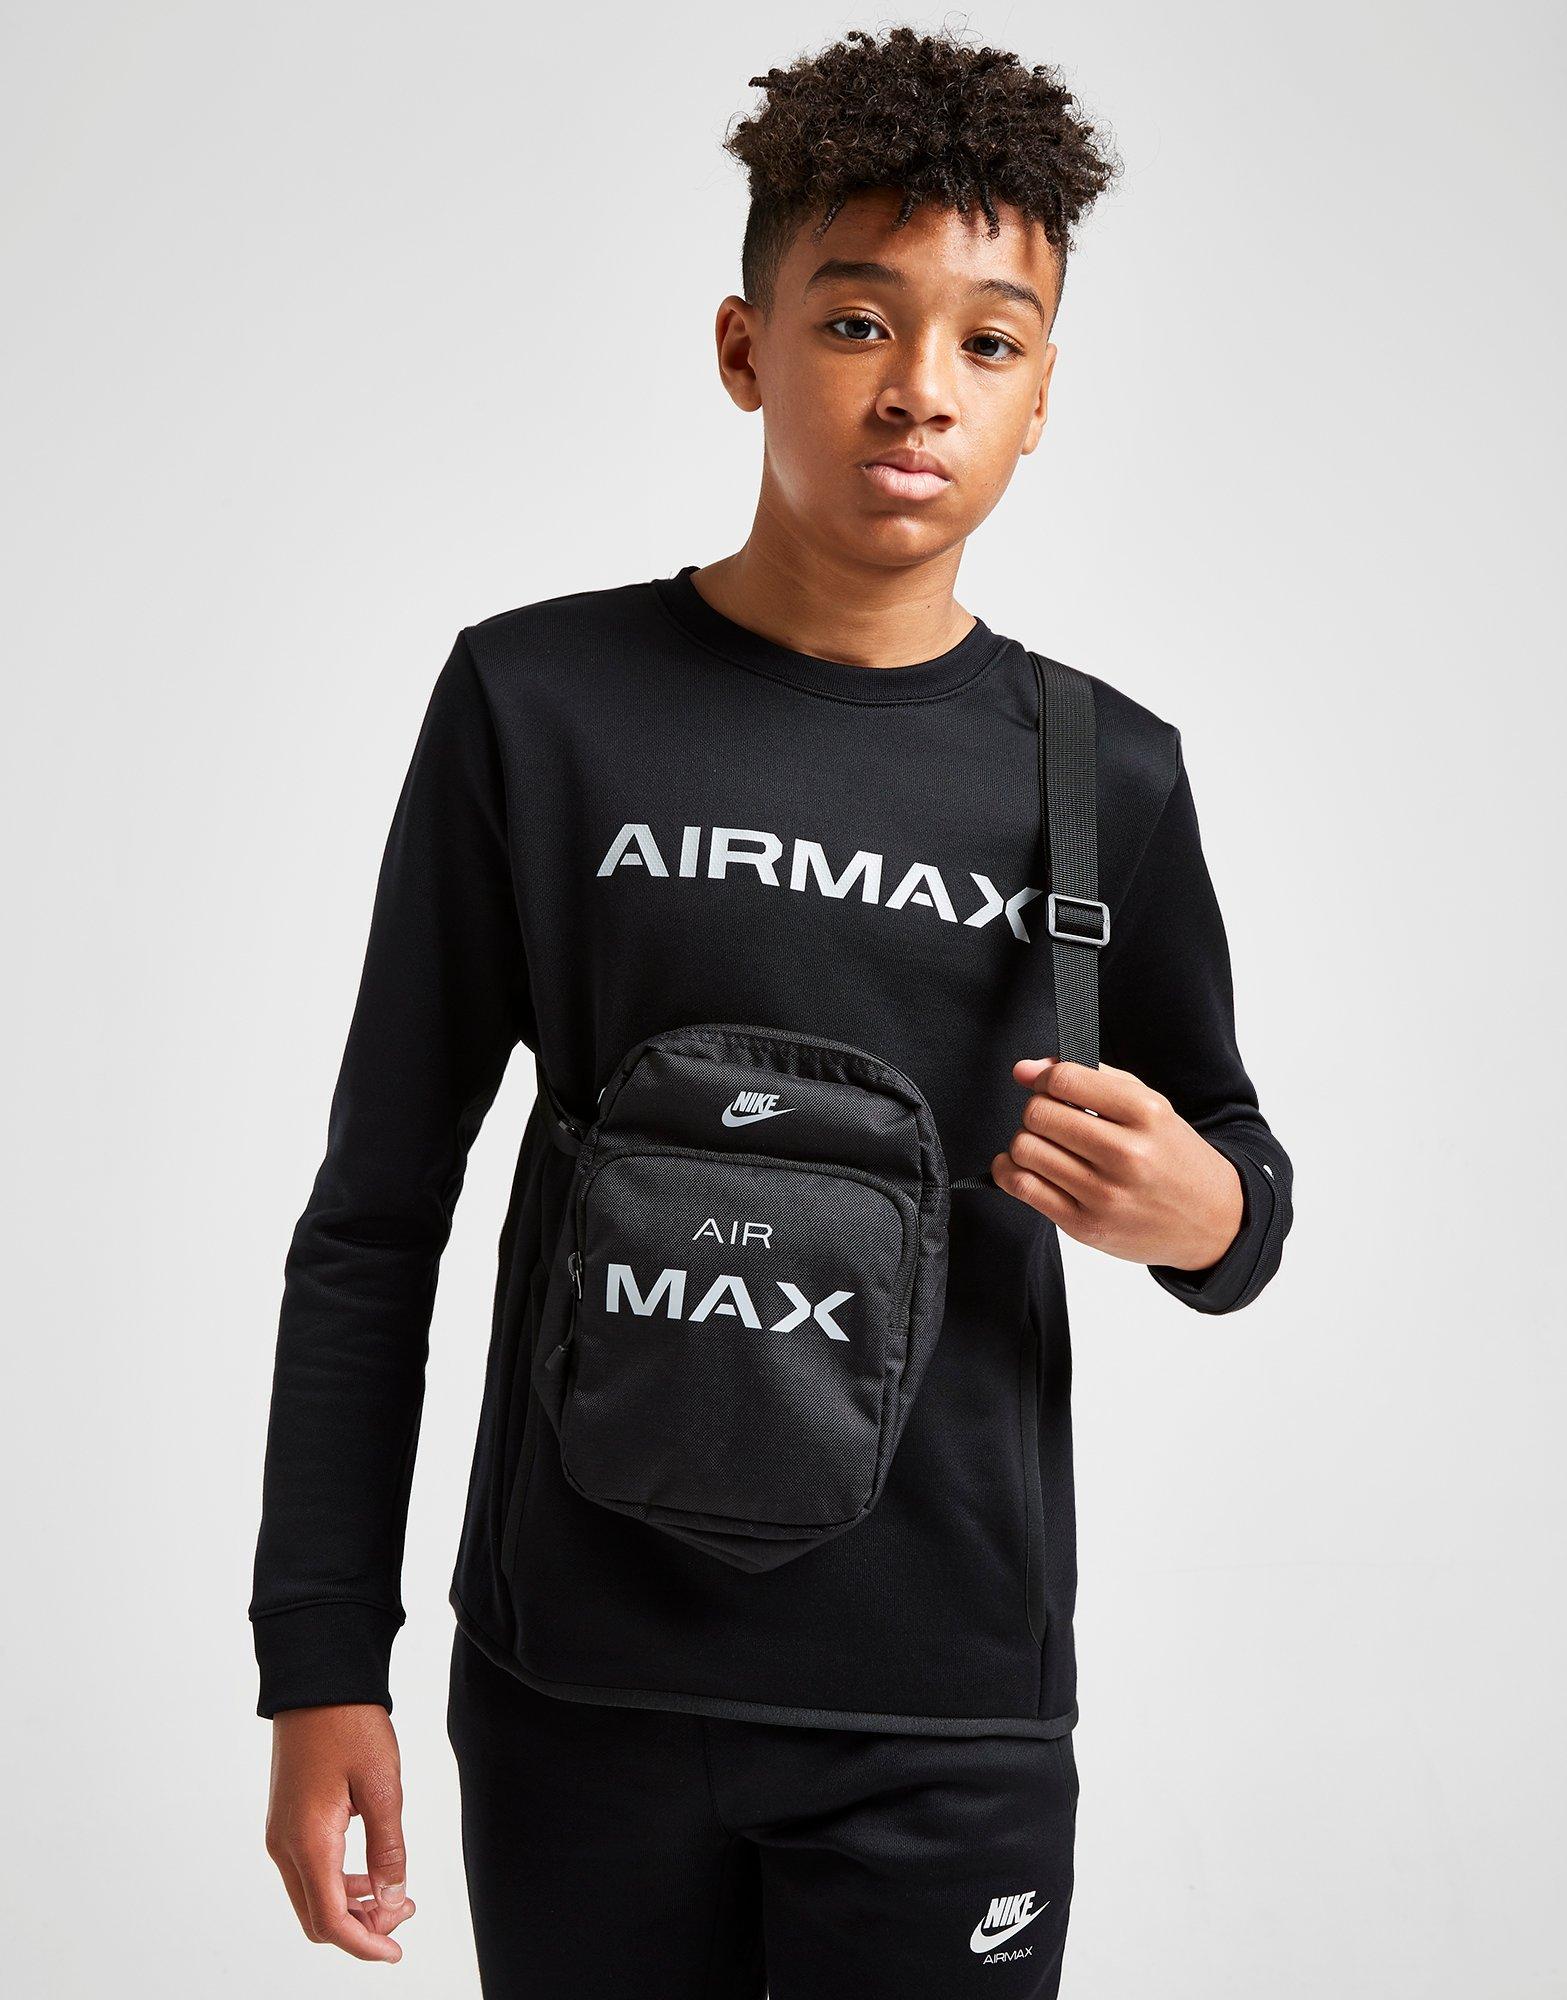 separation shoes 92eba ea997 Nike Air Max FT Crew Sweatshirt Junior   JD Sports